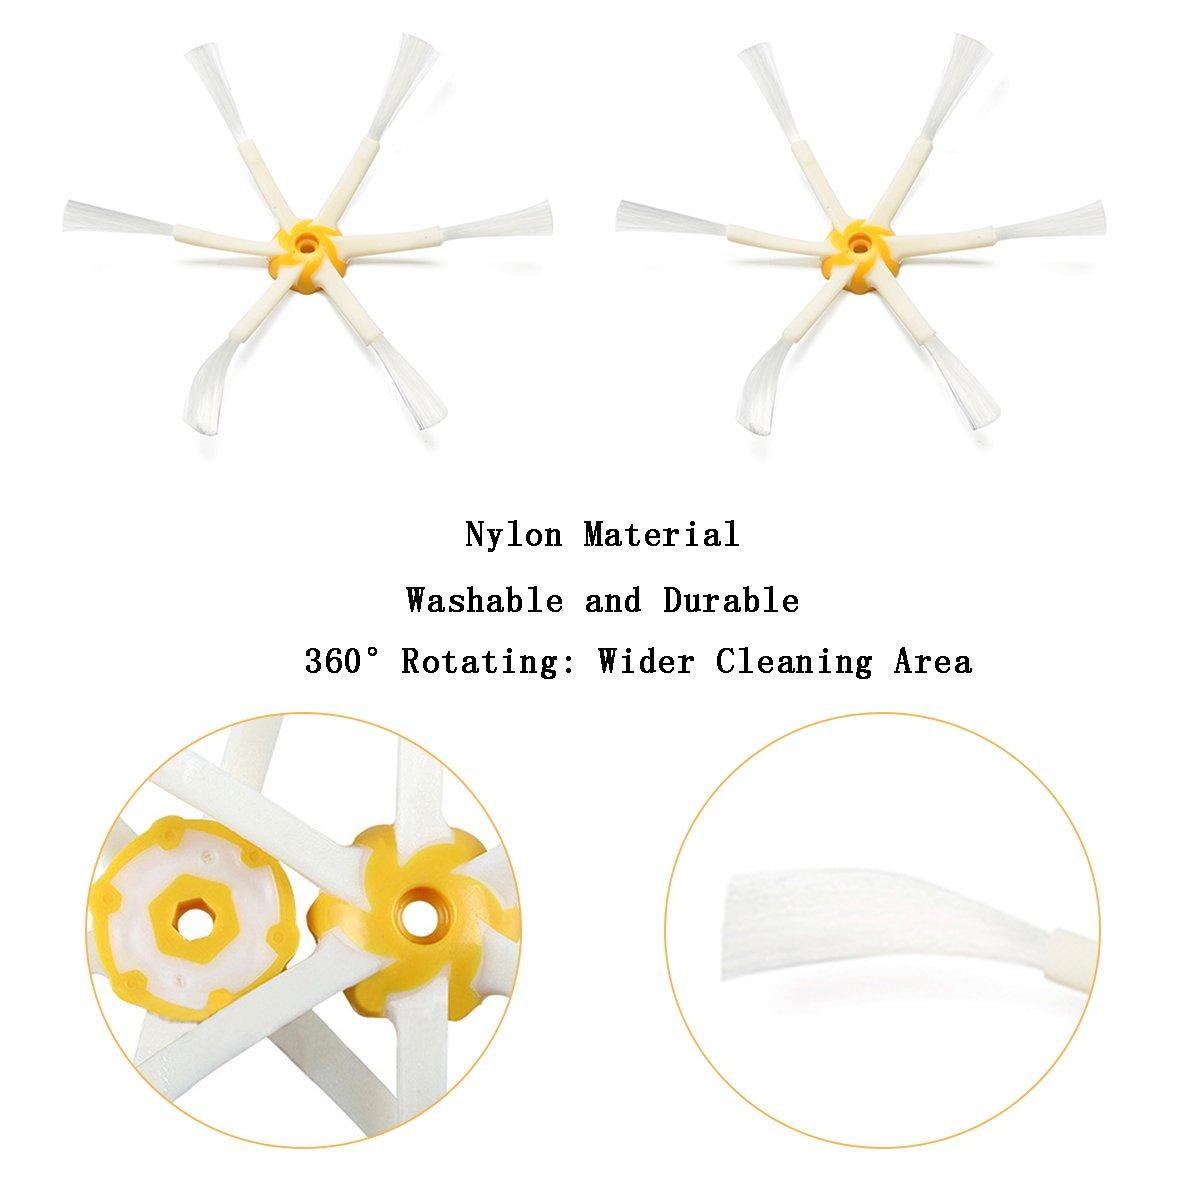 Amazon.com - MZY LLC 5 x Side Brush 6-armed & 5 x Screw for iRobot Roomba 500 600 700 Series 530 540 550 560 570 580 650 760 770 780 Vacuum Cleaning Robots ...